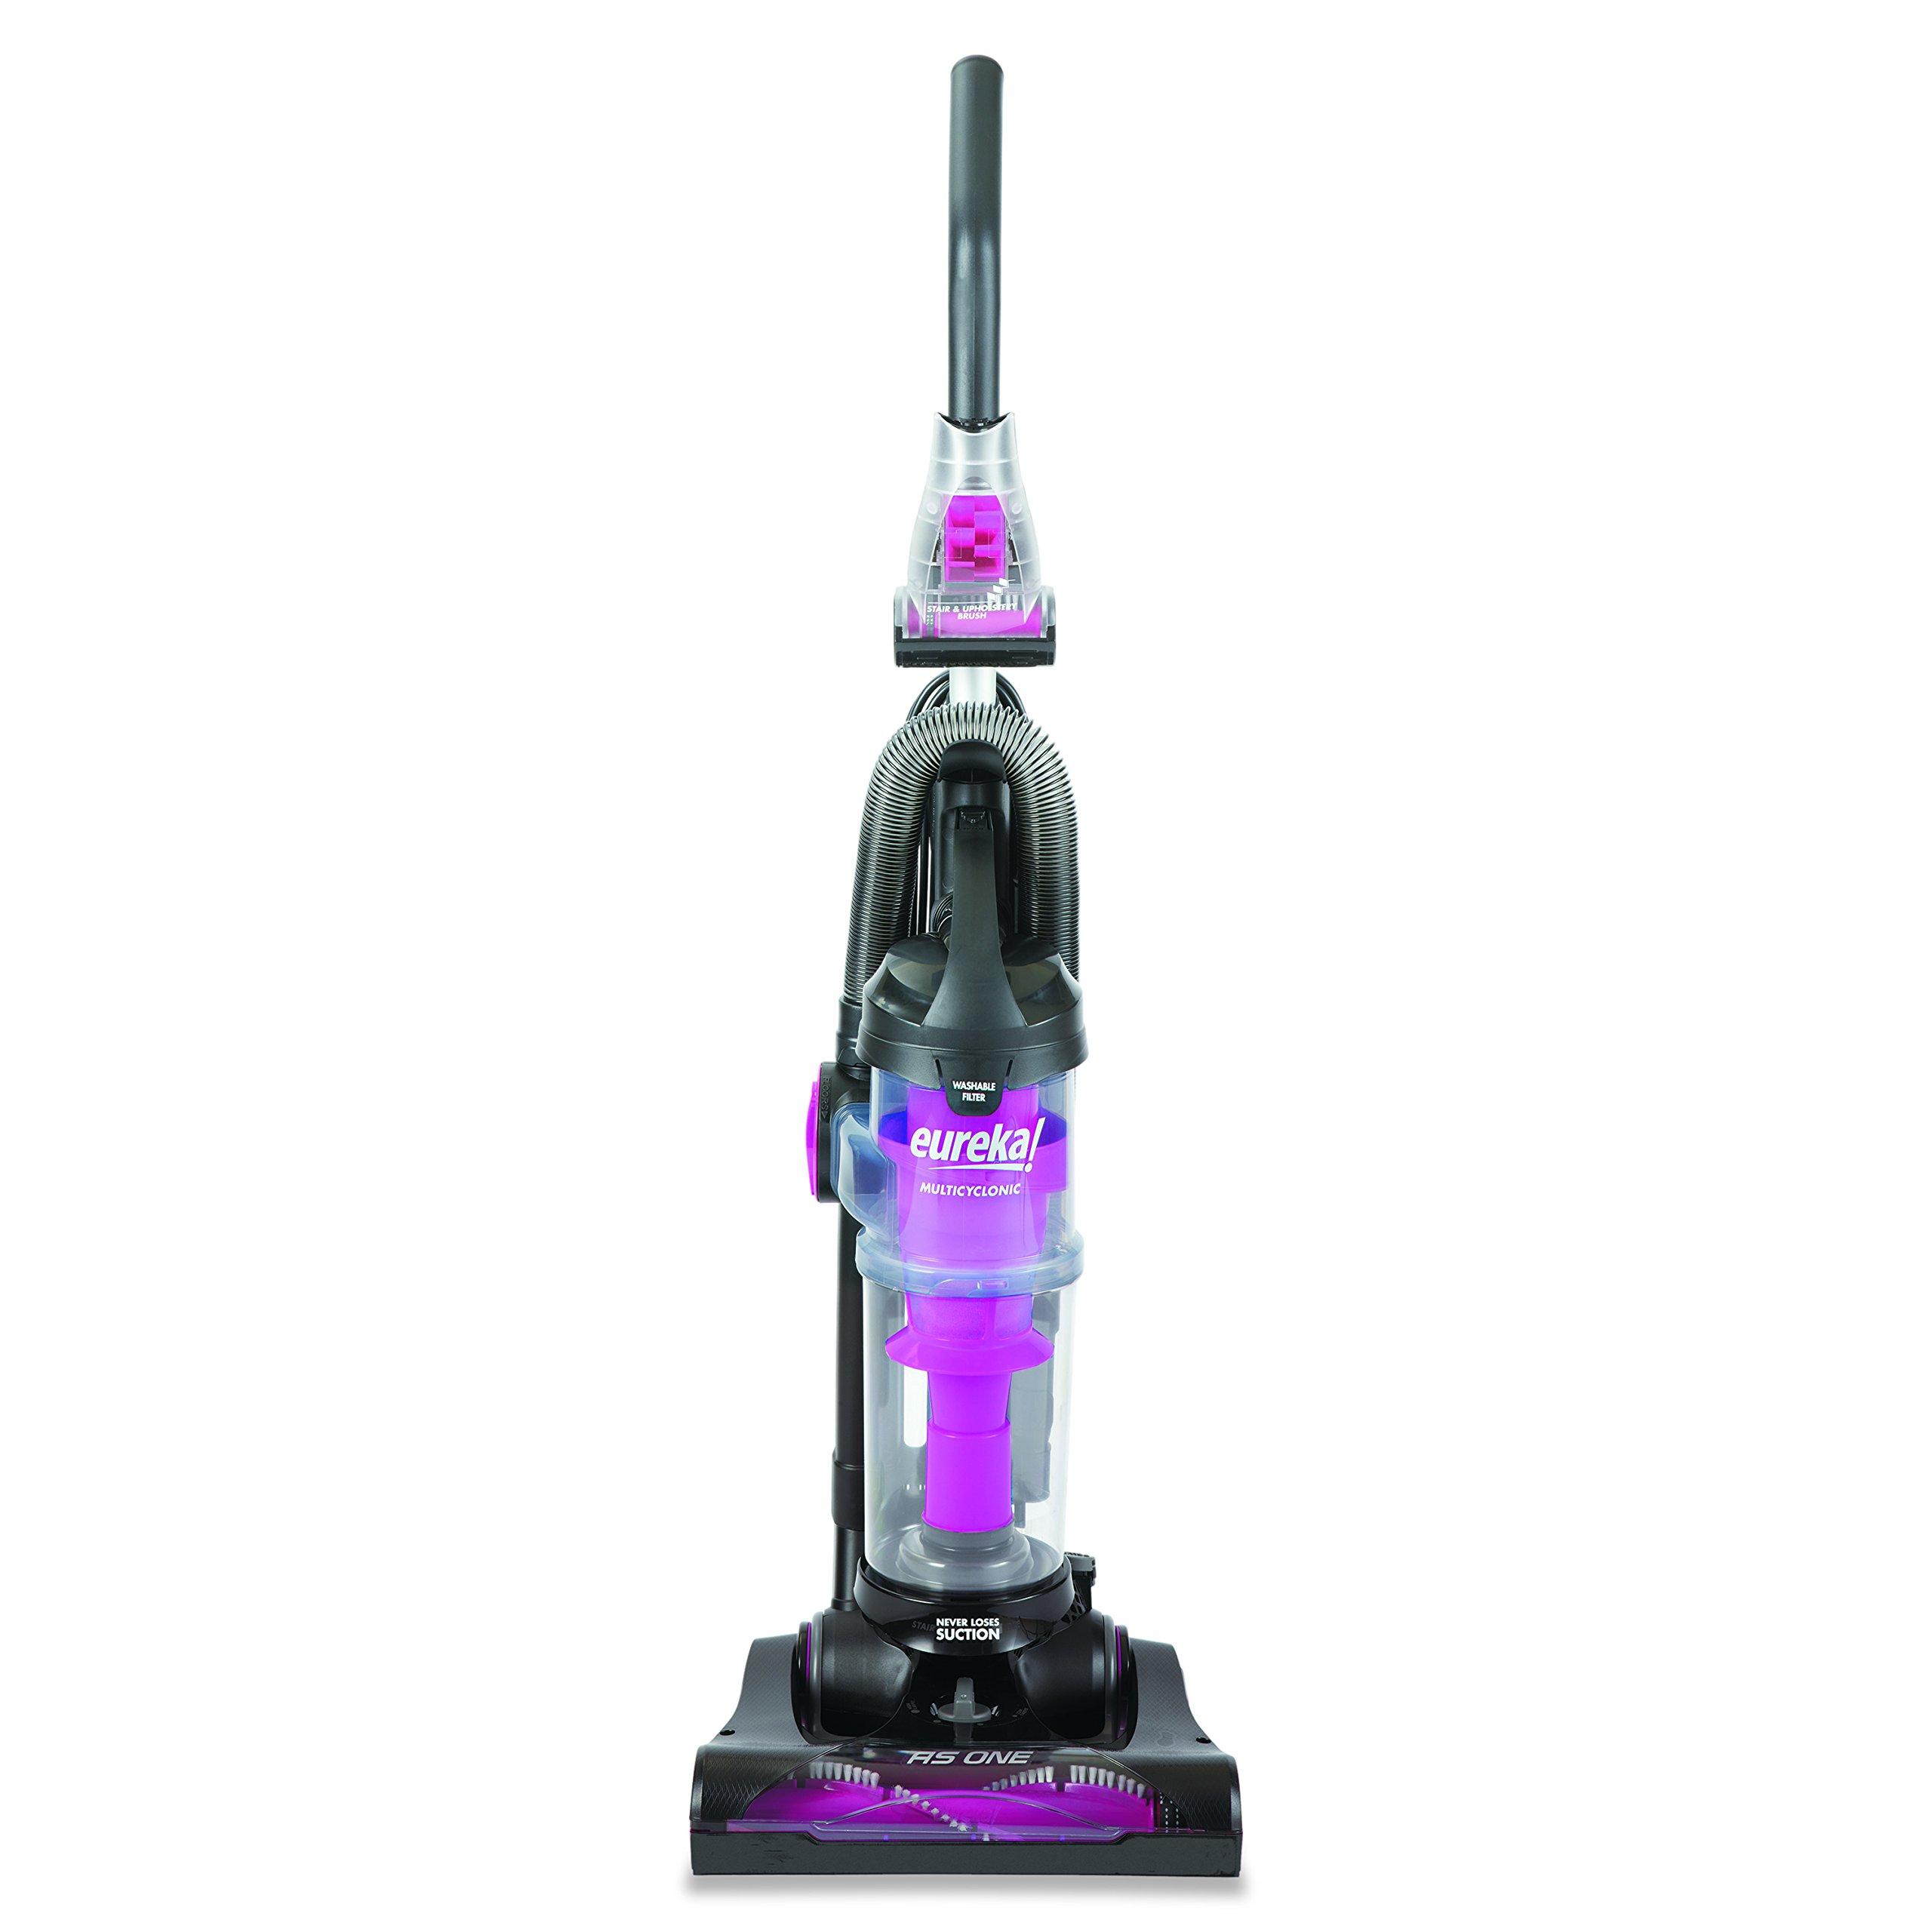 Eureka AS2113A AirSpeed ONE Bagless Upright Vacuum, 10 amp, 8 lbs, Black/Blue